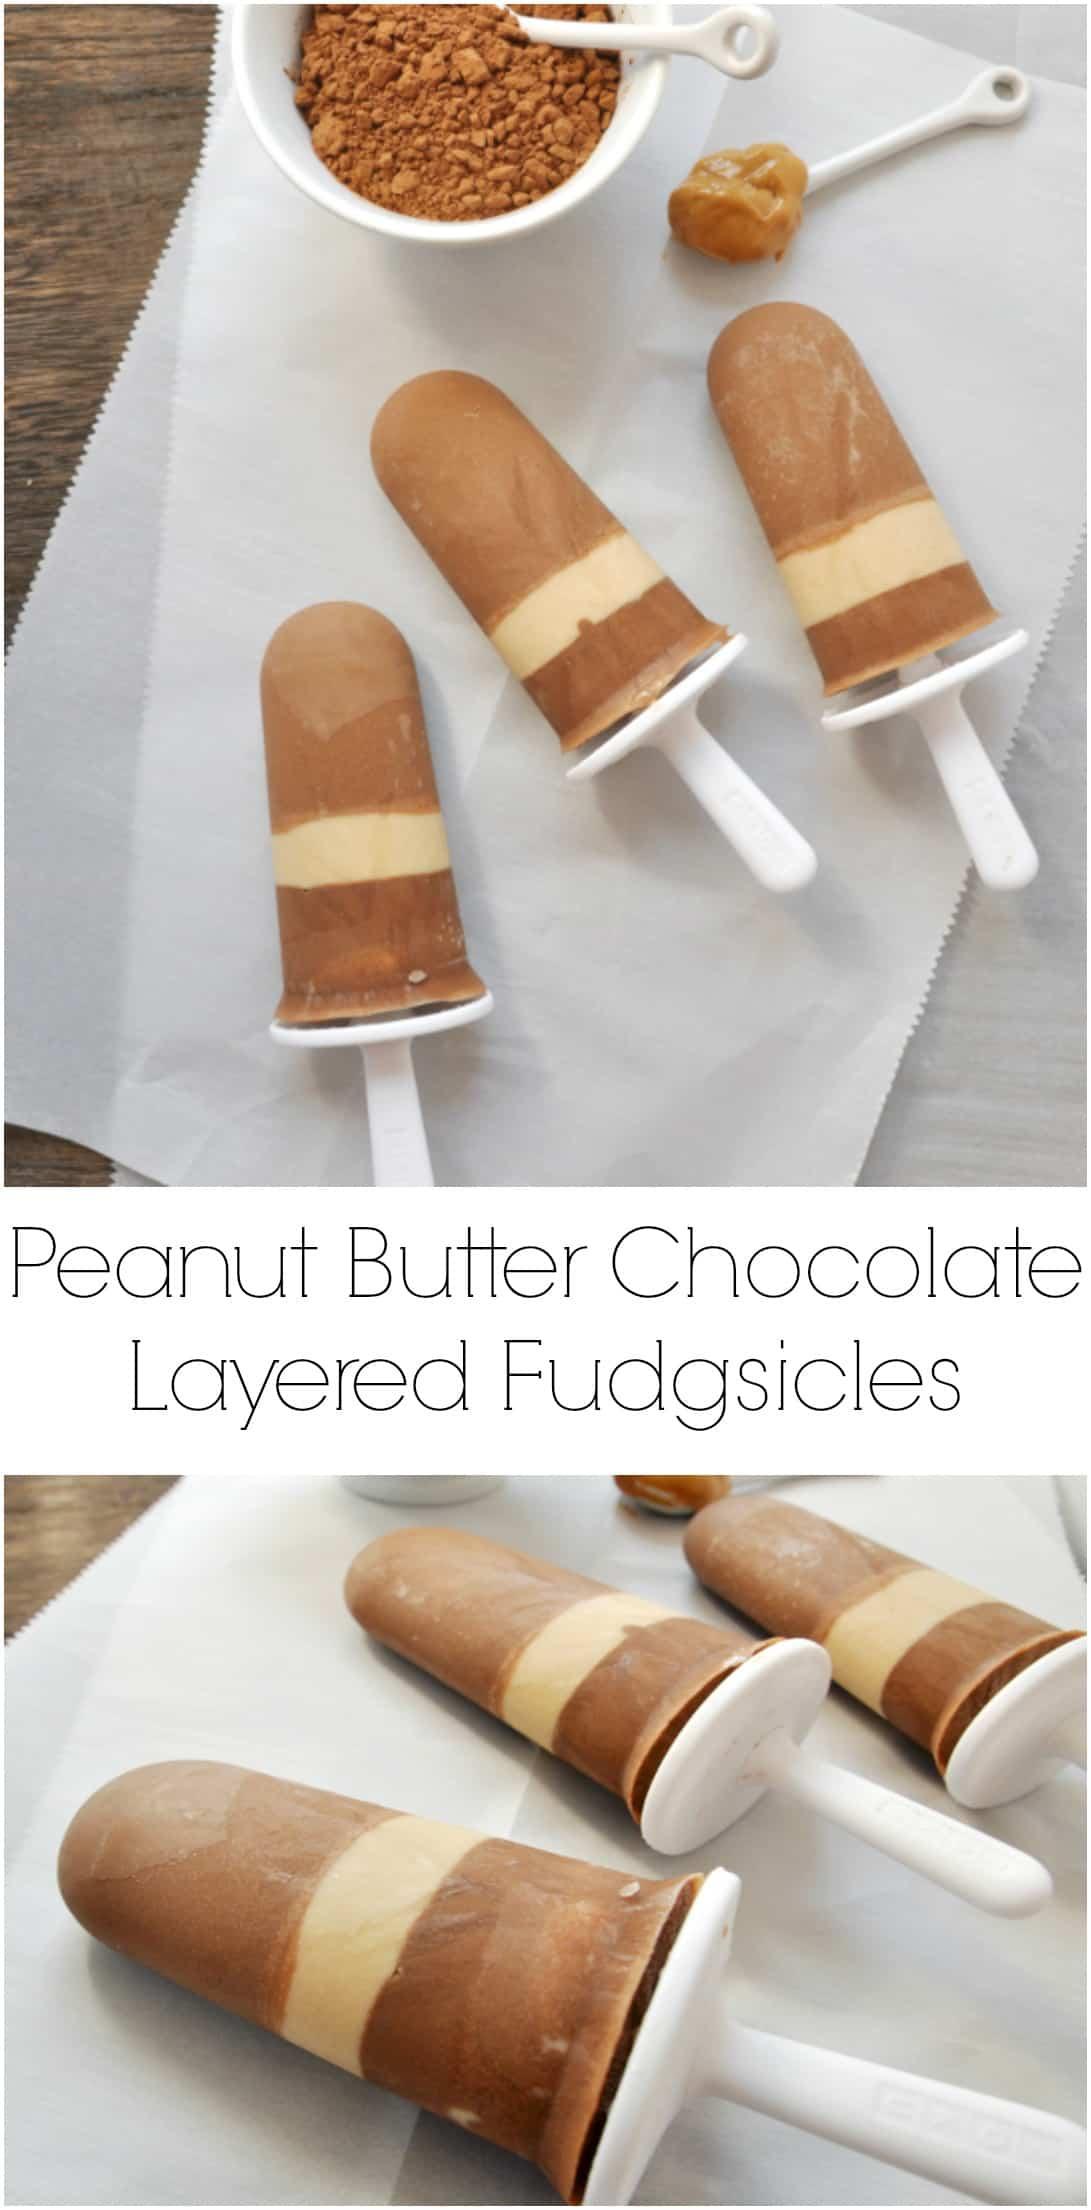 Peanut Butter Chocolate Layered Fudgsicles